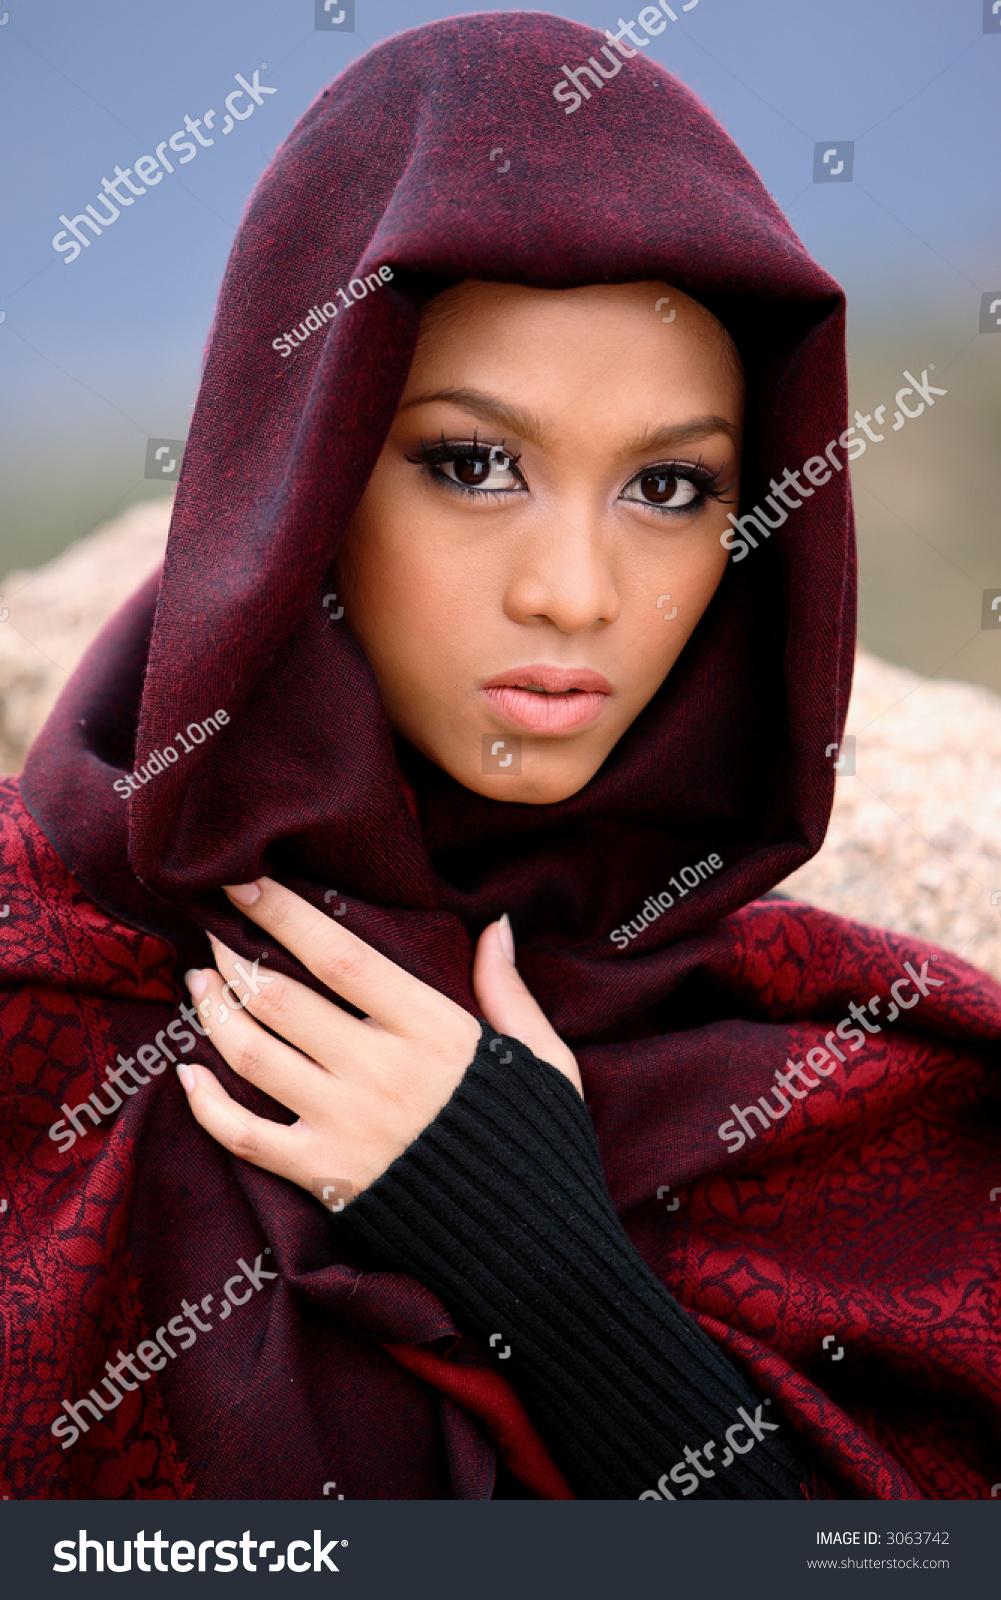 toone single muslim girls 2012/2/5 kala jado ka free ilaz for only quraan kala jadoo ka ilaz quran se contact haji sab mob +917411926251,+919379052253, sky pe excellentservices1.